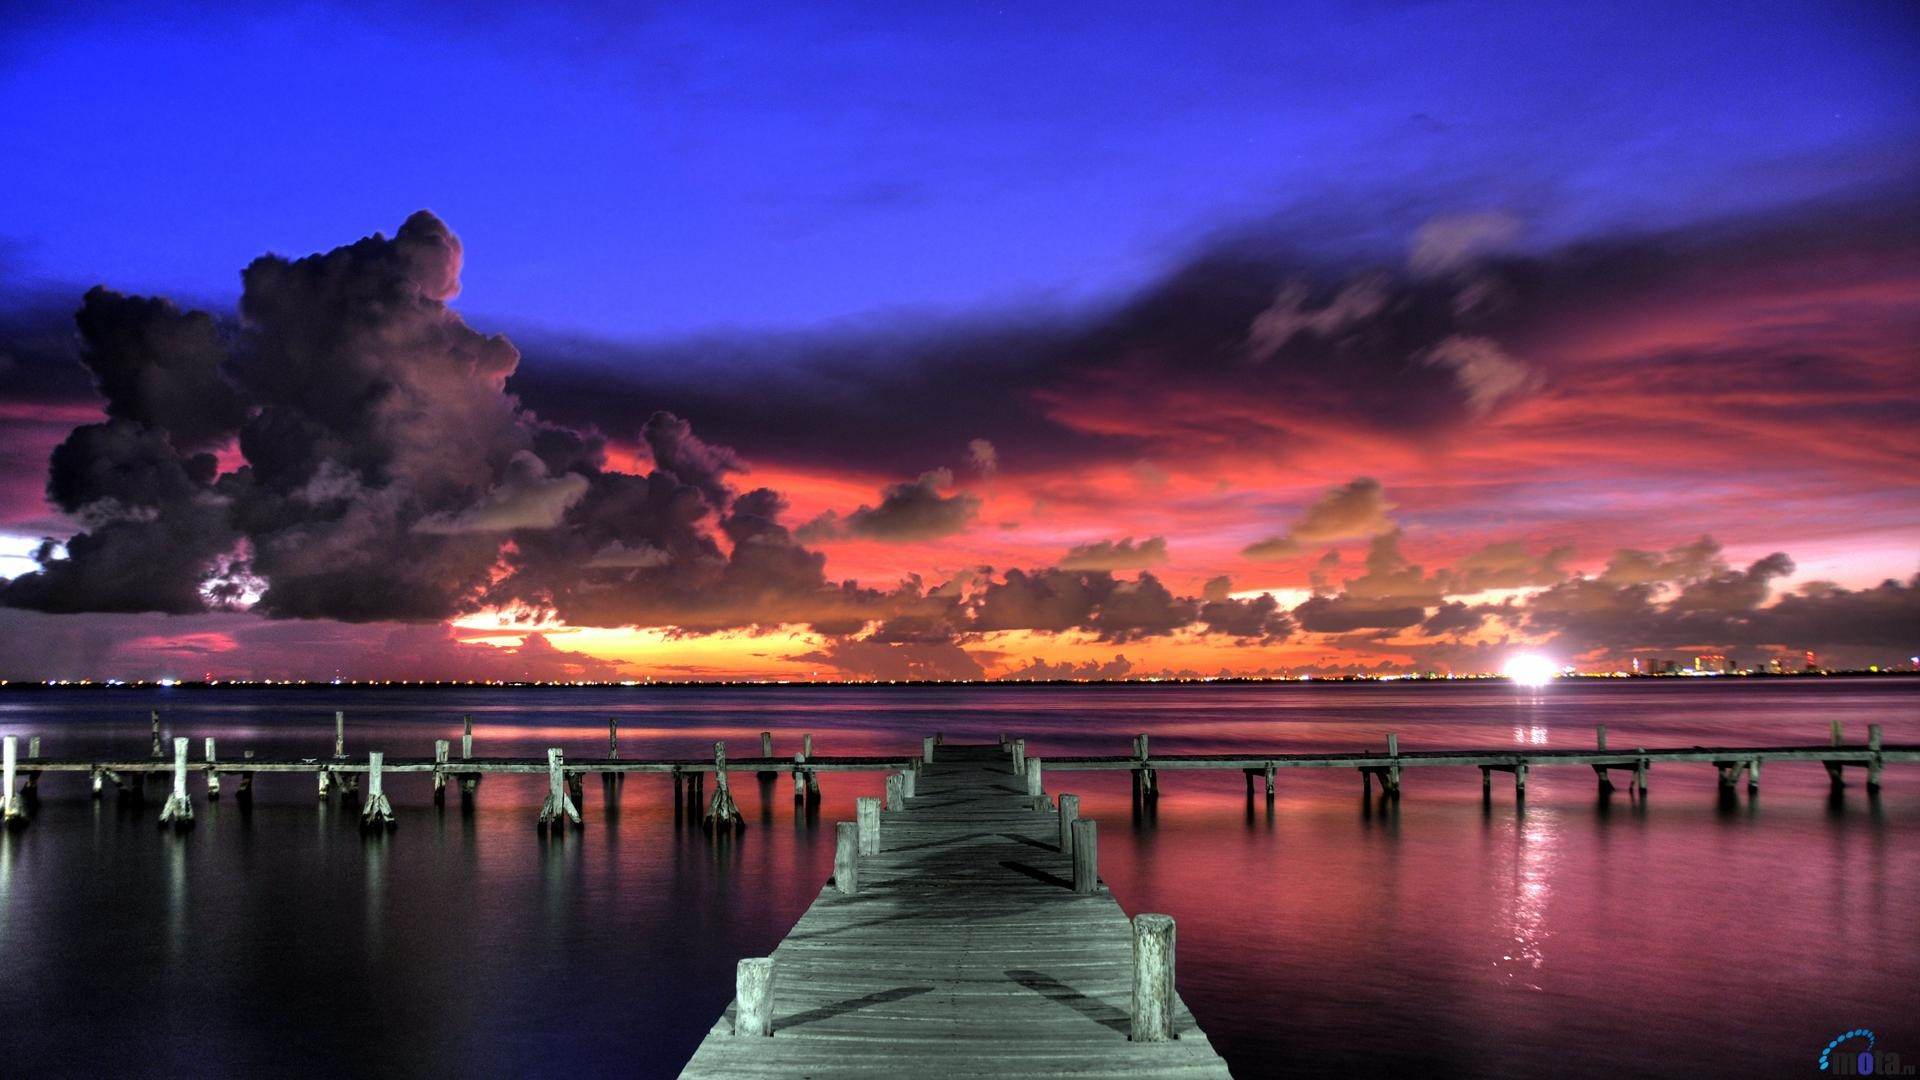 1920x1080 Gorgeous, Purple, Sunset, Wallpaper, High, Definition, Desktop, Background, Pictures, Free, Cool, Desktop Images, Best, 1920×1080 Wallpaper HD